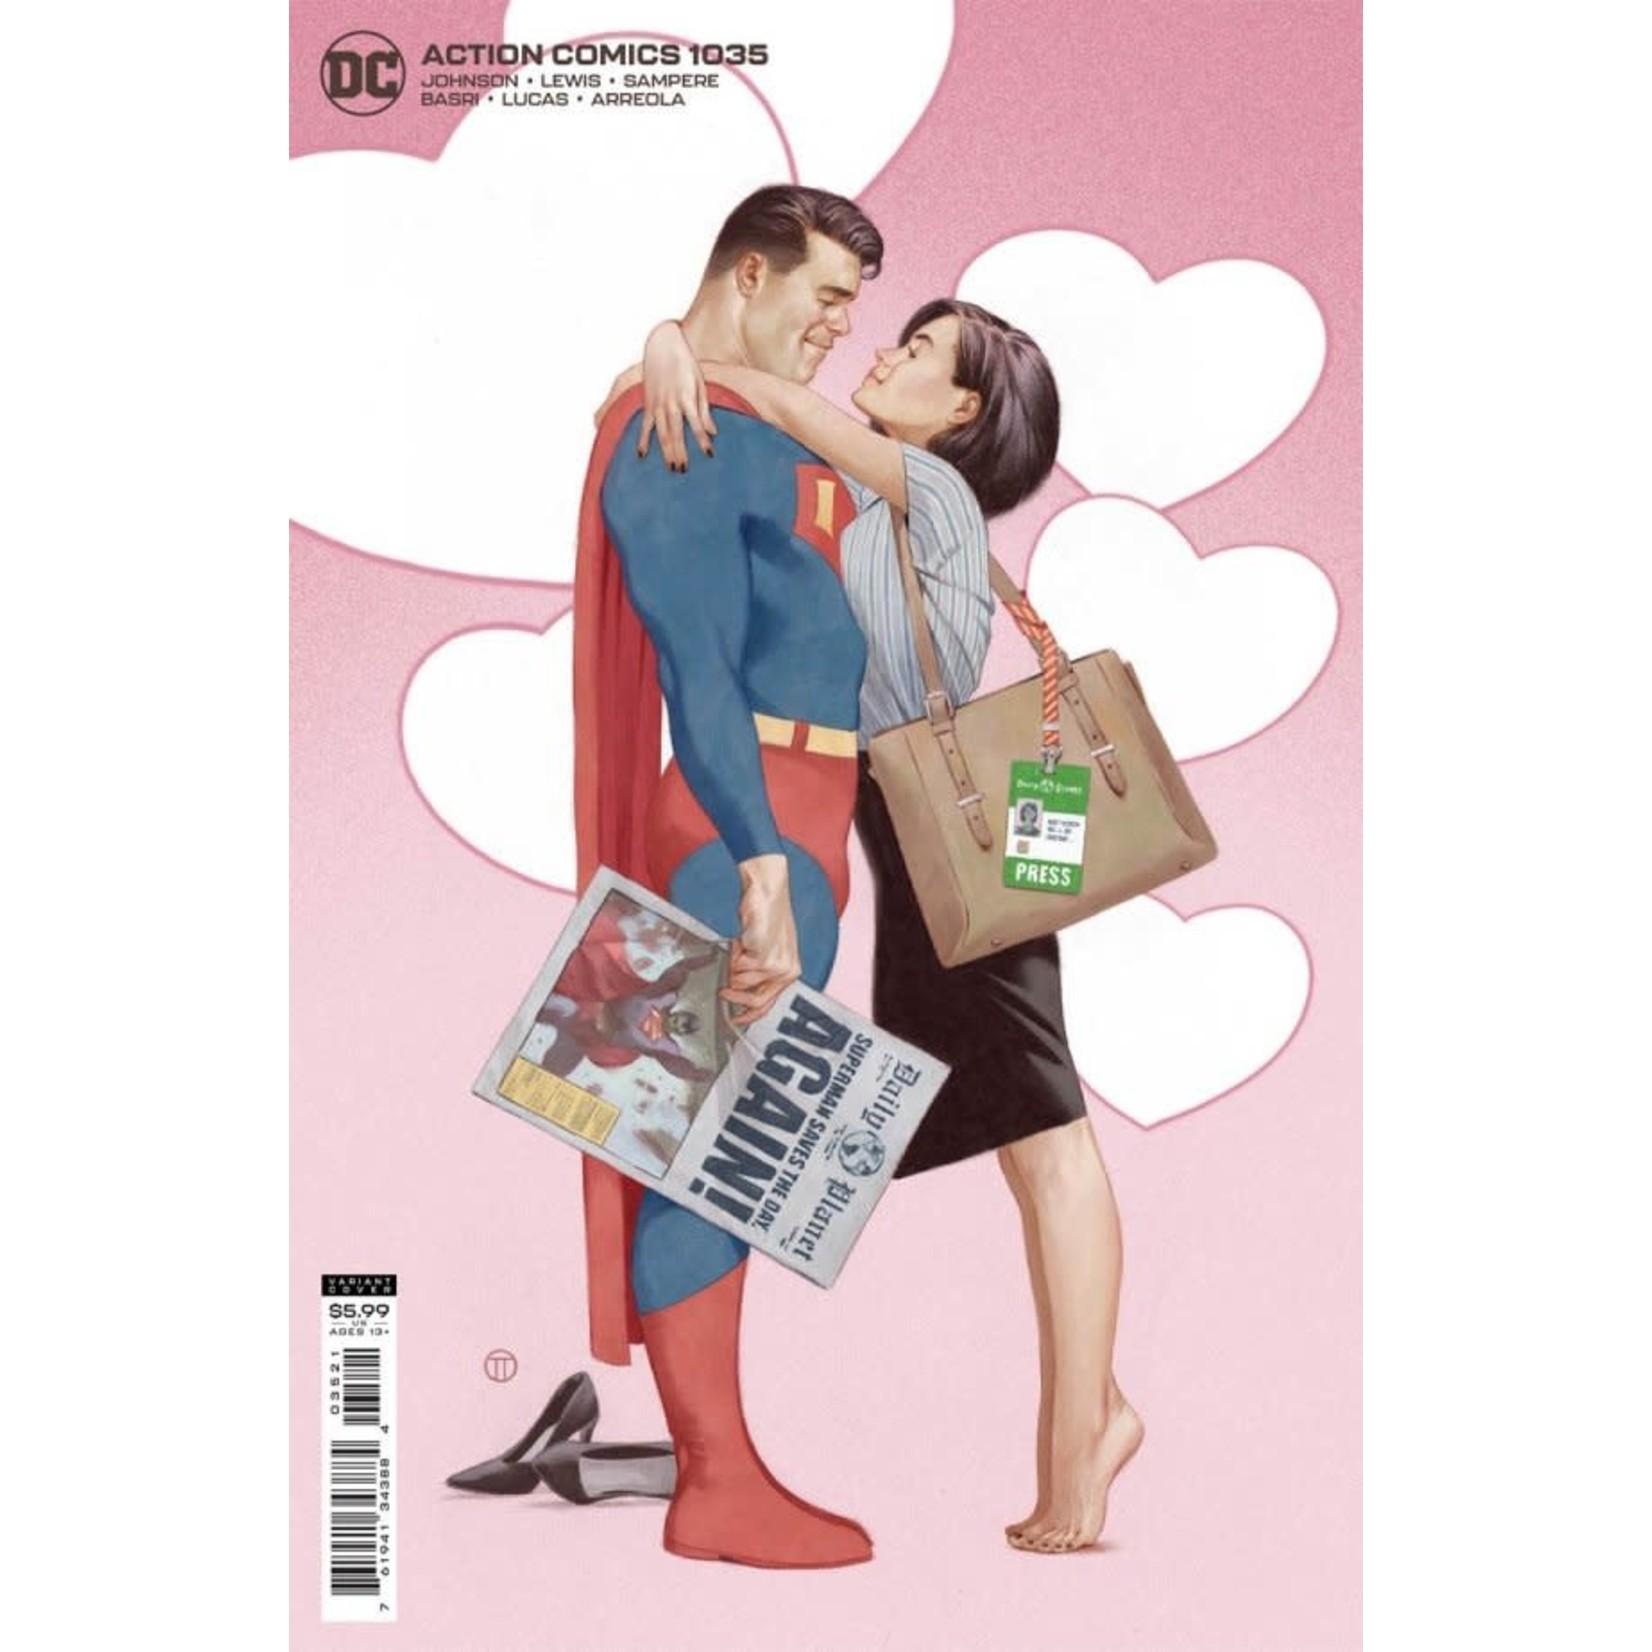 DC Comics Action Comics #1035 Card Stock Variant Cover